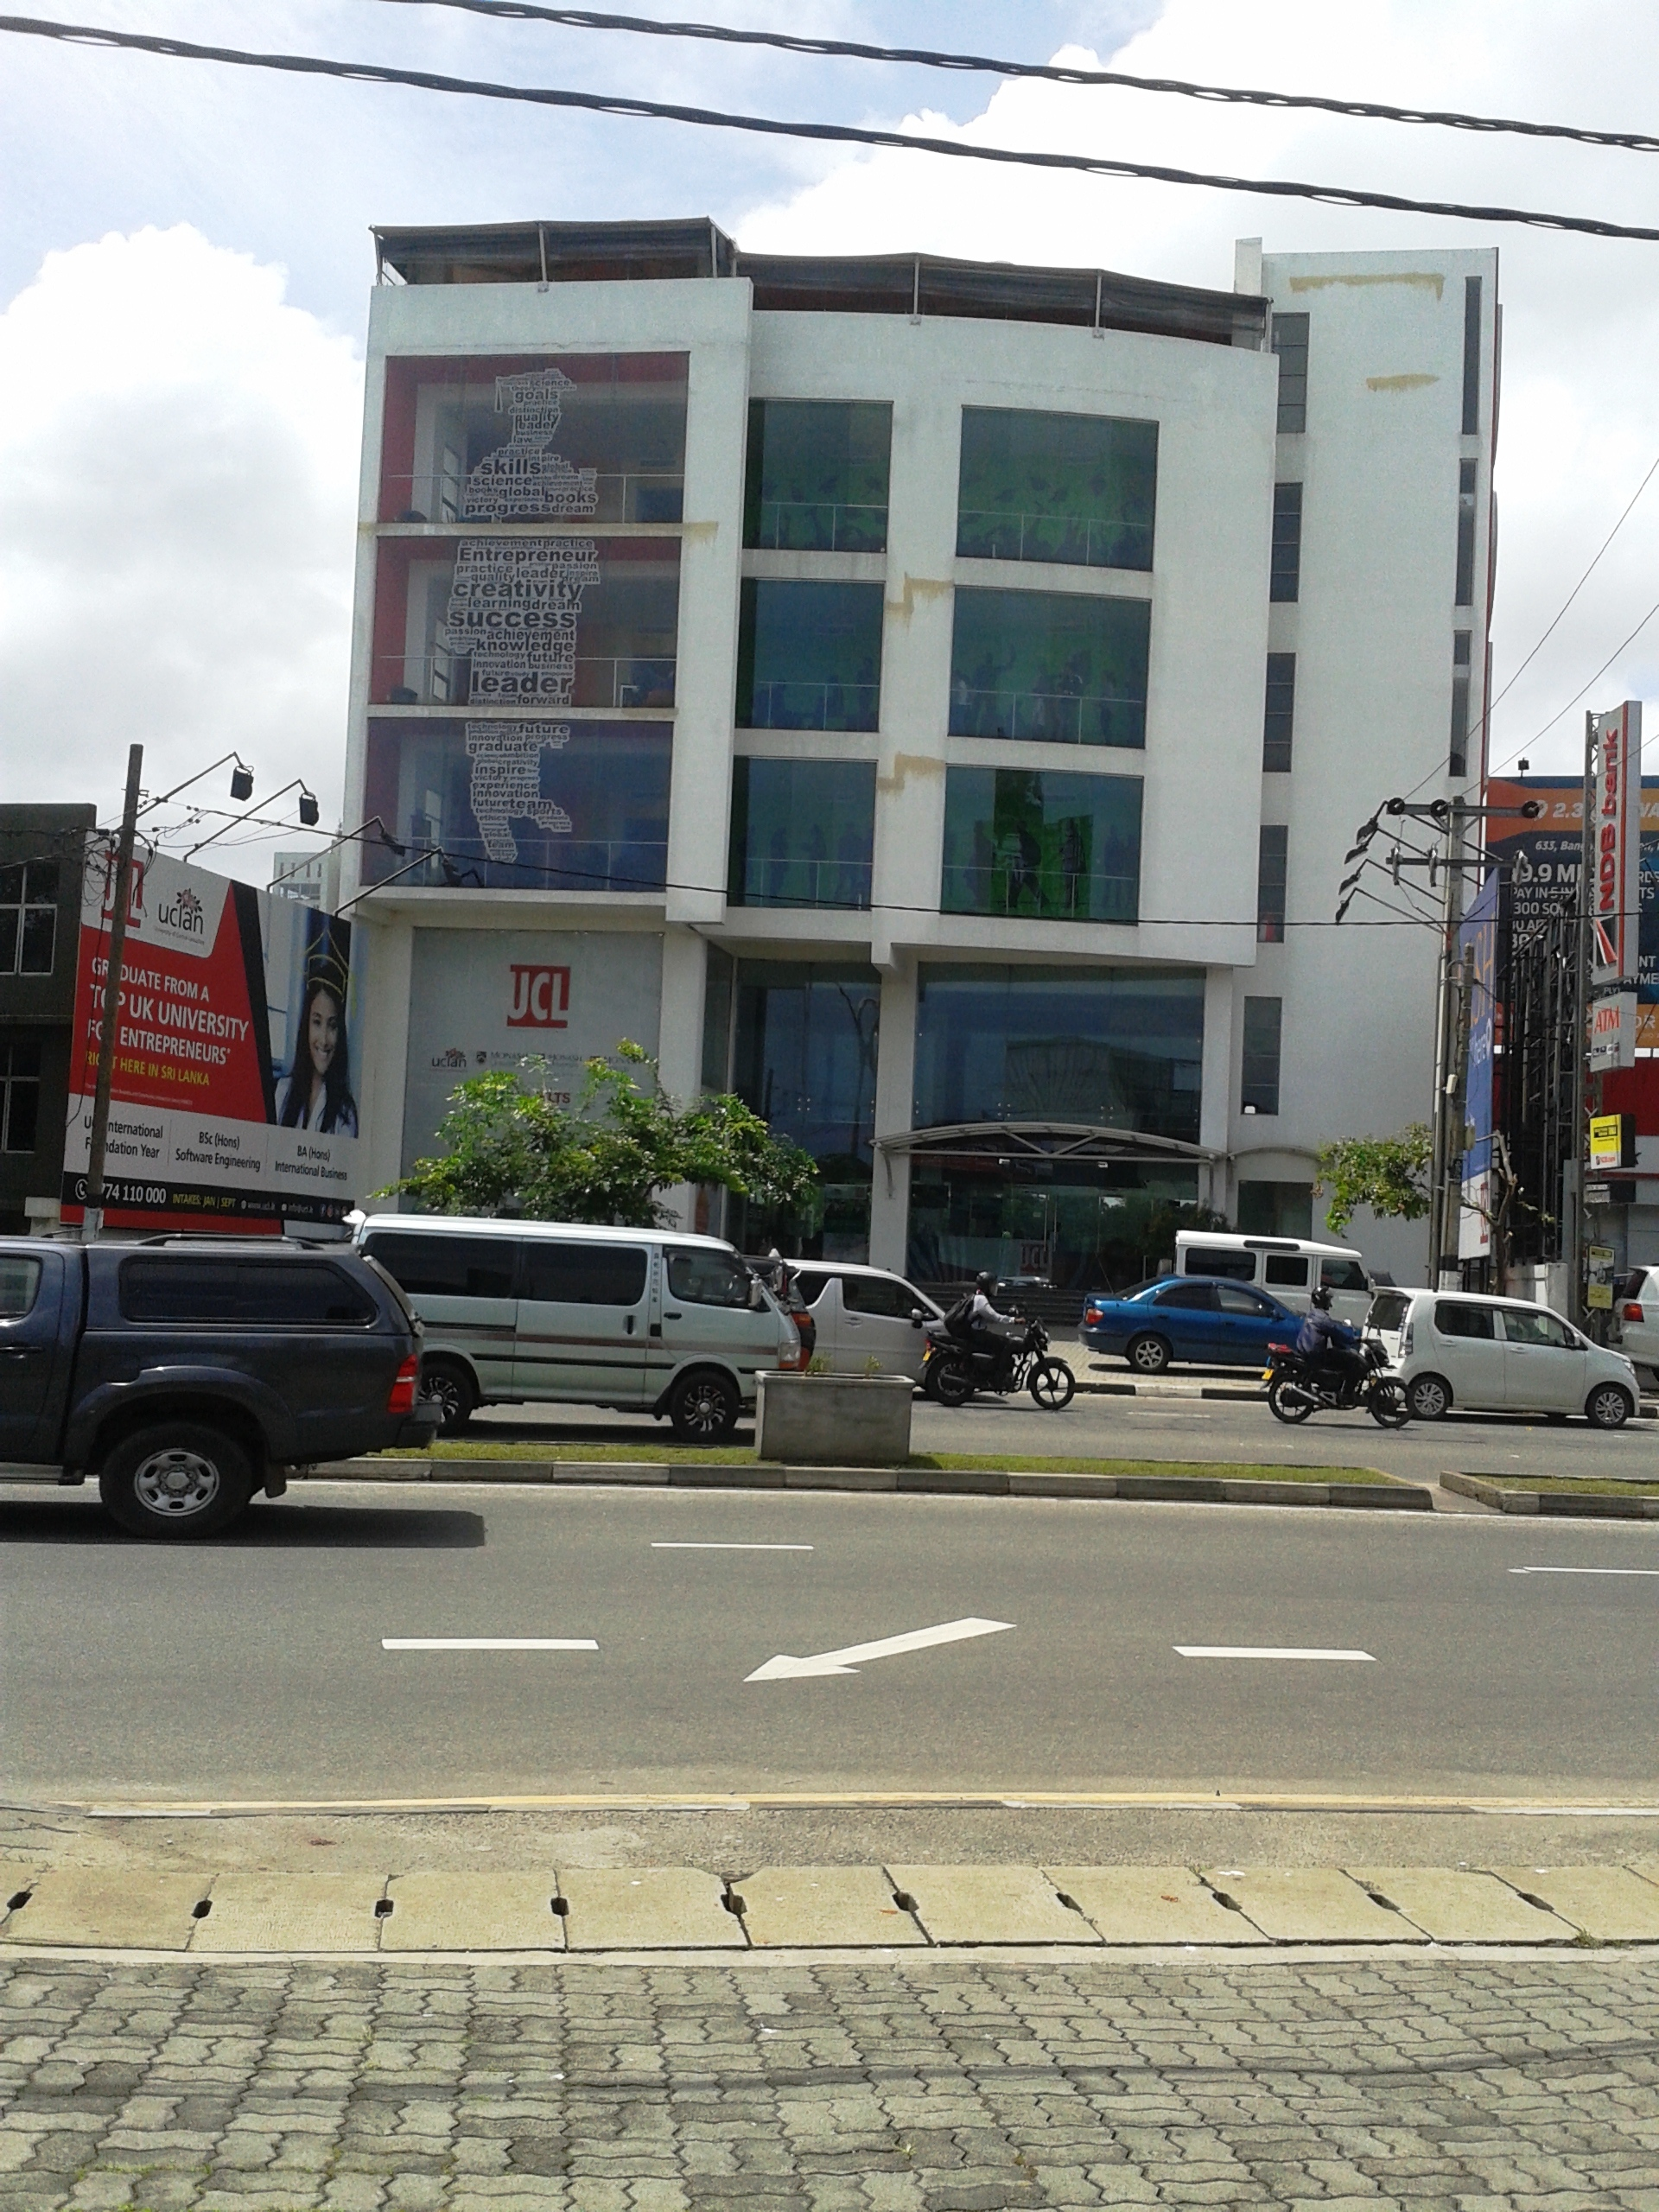 OFFICE COMPLEX AT SRI JAYAWARDHANAPURA, KOTTE, SRI LANKA